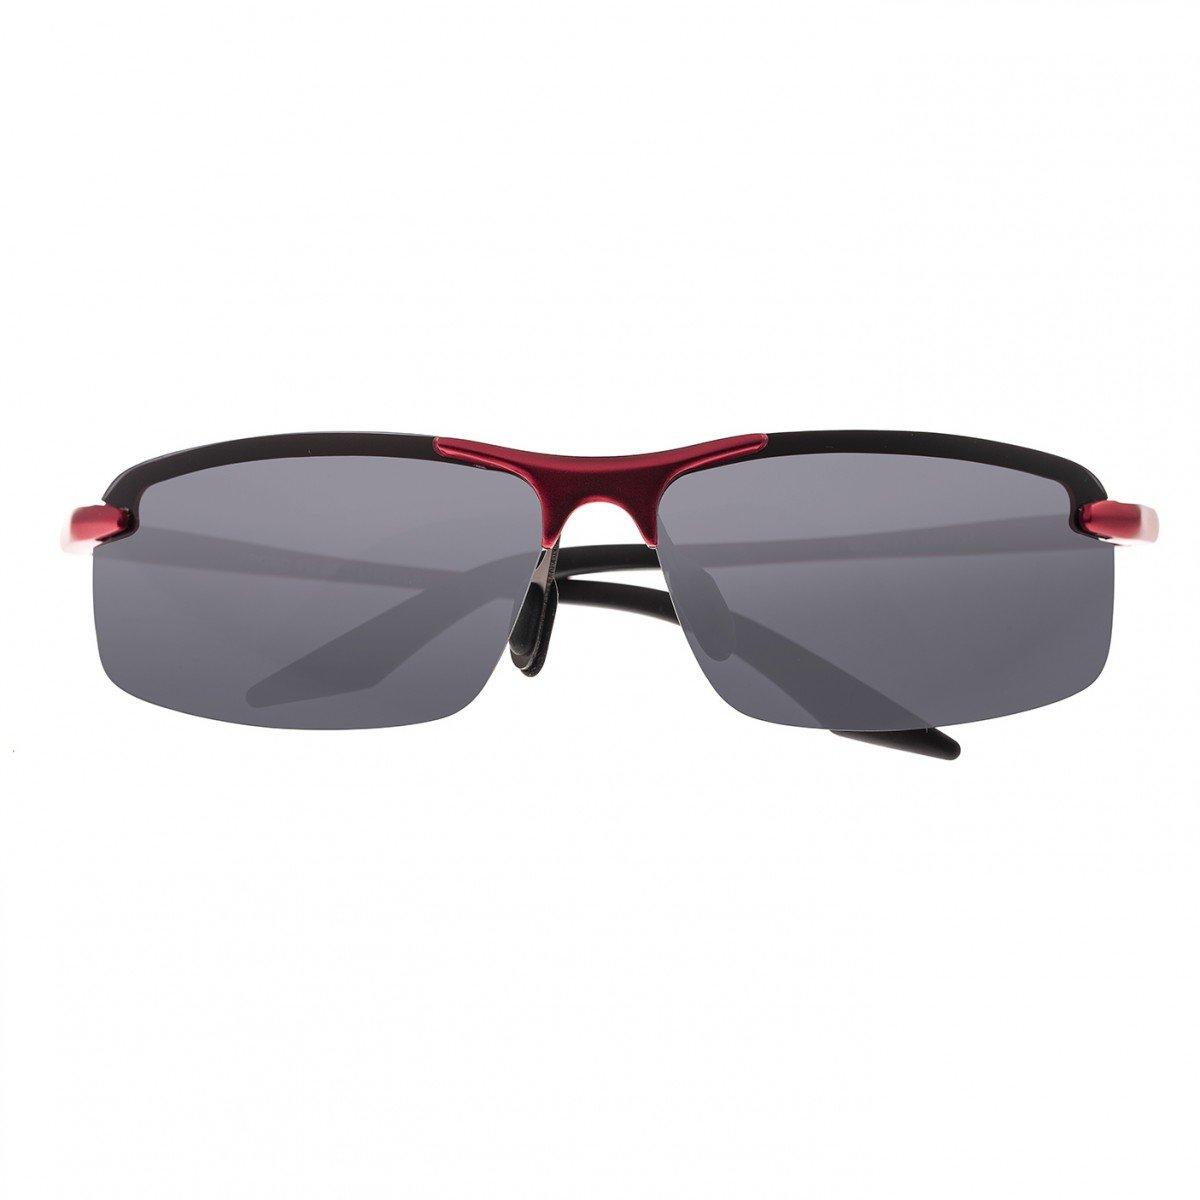 1f9e0adb90 Breed Lynx Aluminium Sunglasses - Red Black (BSG015RD)  Amazon.in  Clothing    Accessories